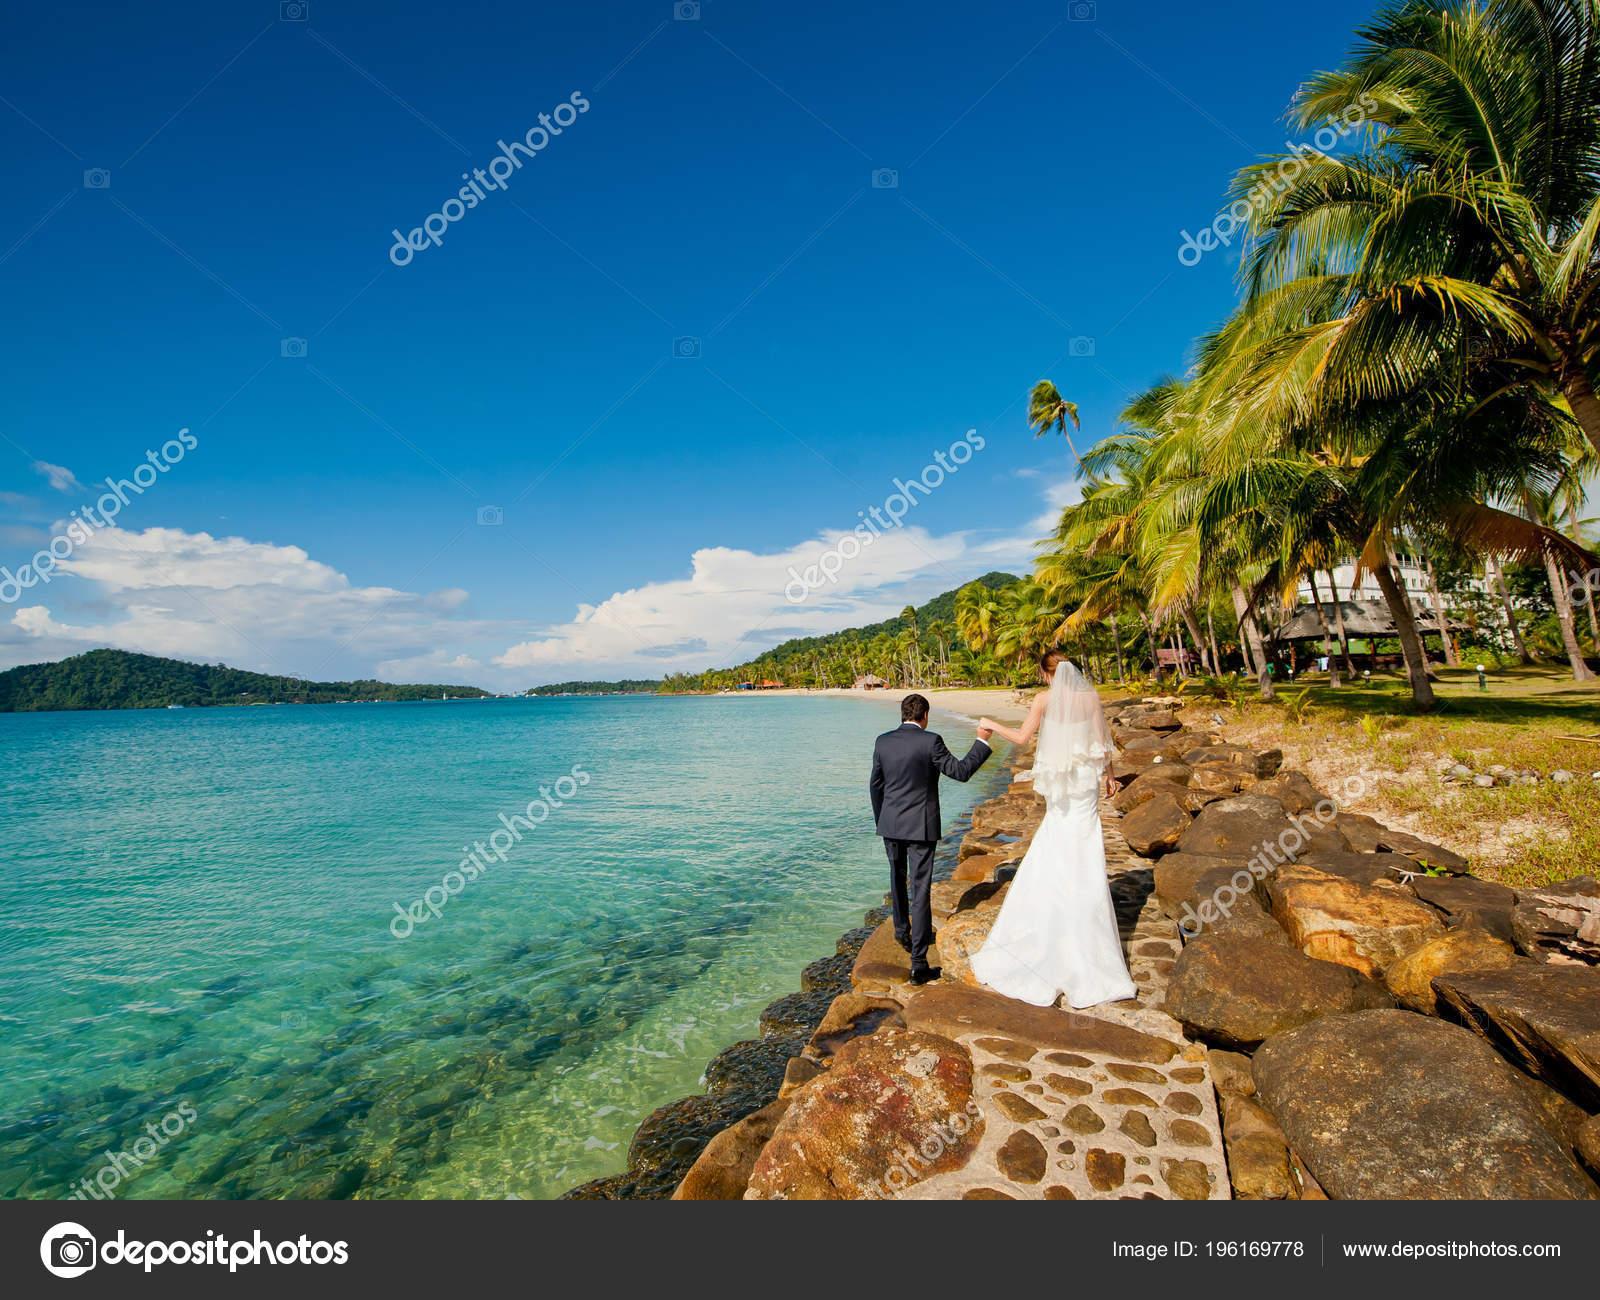 6d6d23d8aa0e4b Bride Groom Wedding Suits Holding Hands Walking Stone Pier Tropical ...